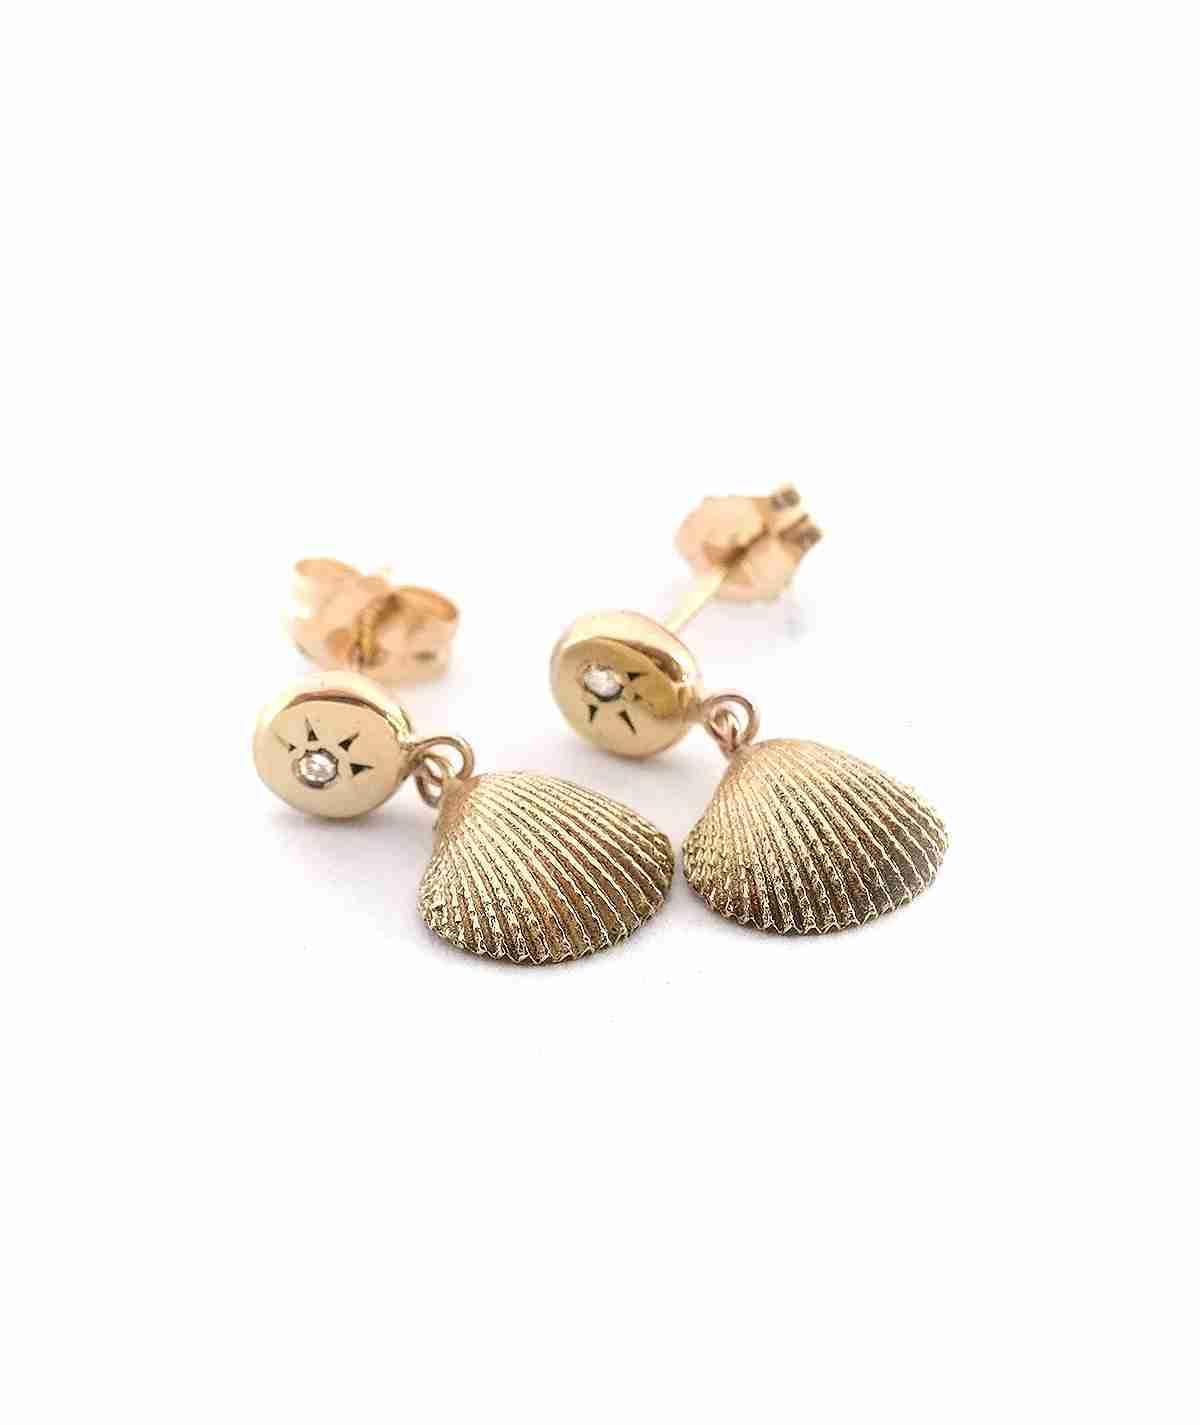 gold seashell stud earrings